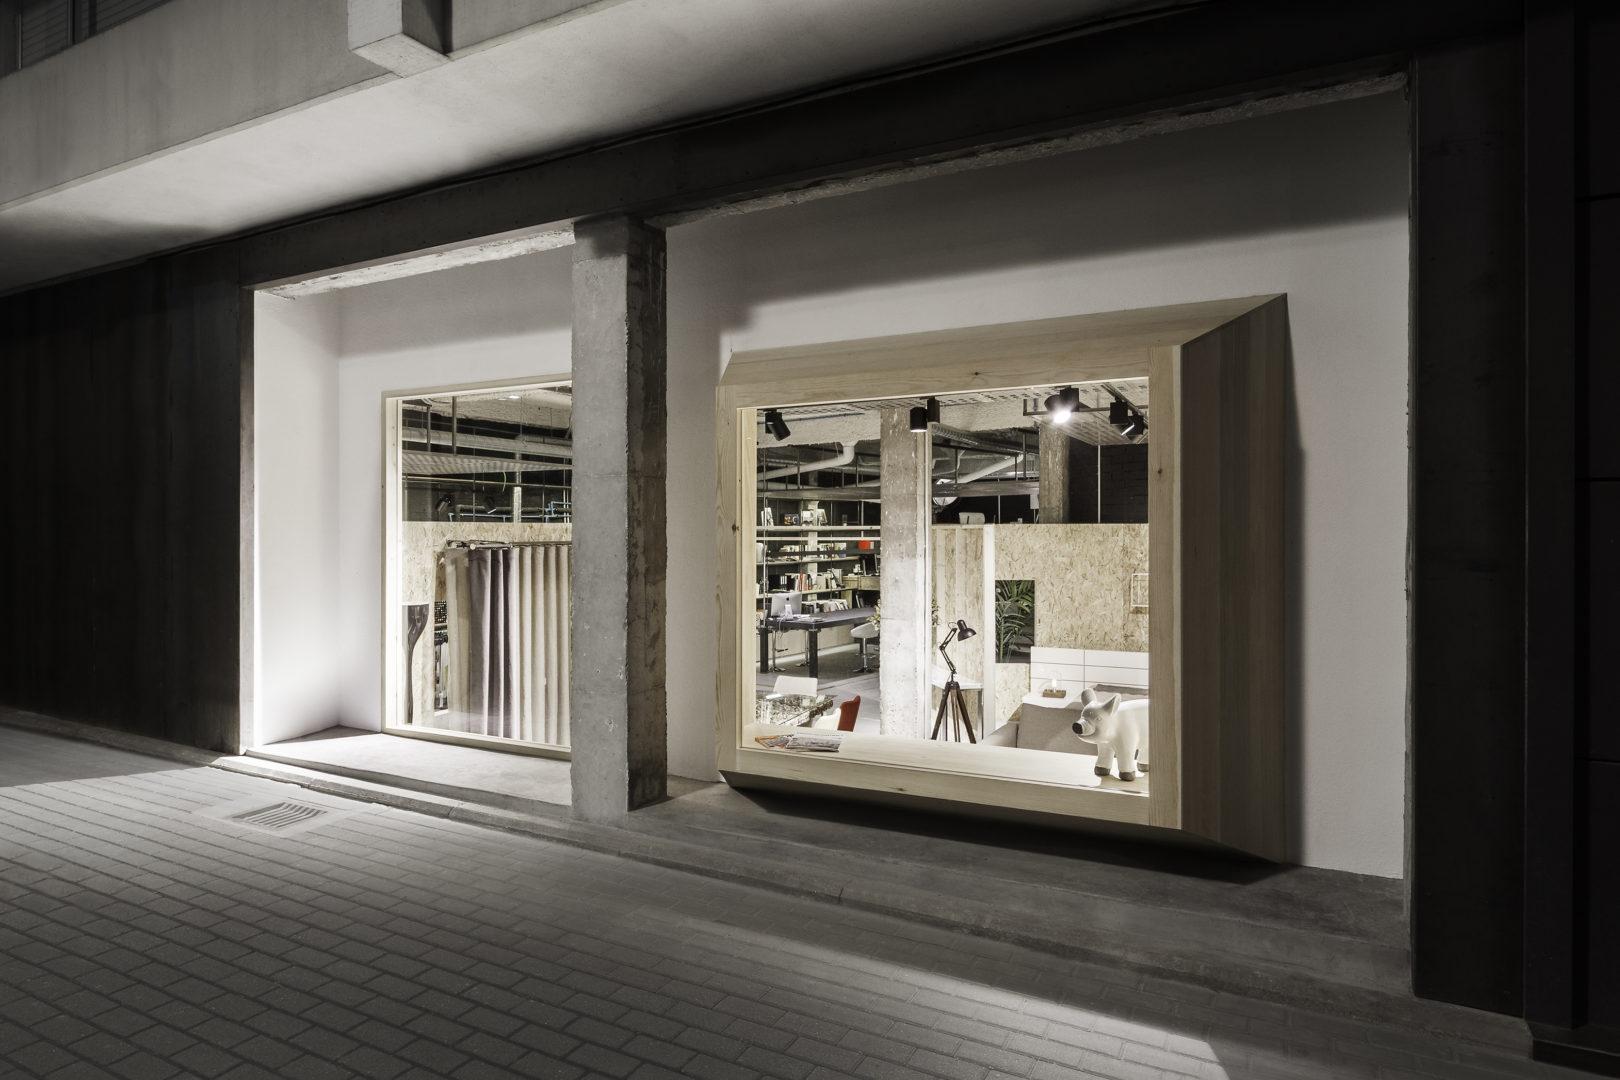 Nanarquitectos Nancontract Interiorismo Diseño Reformas Showroom Concept Habitat Studio